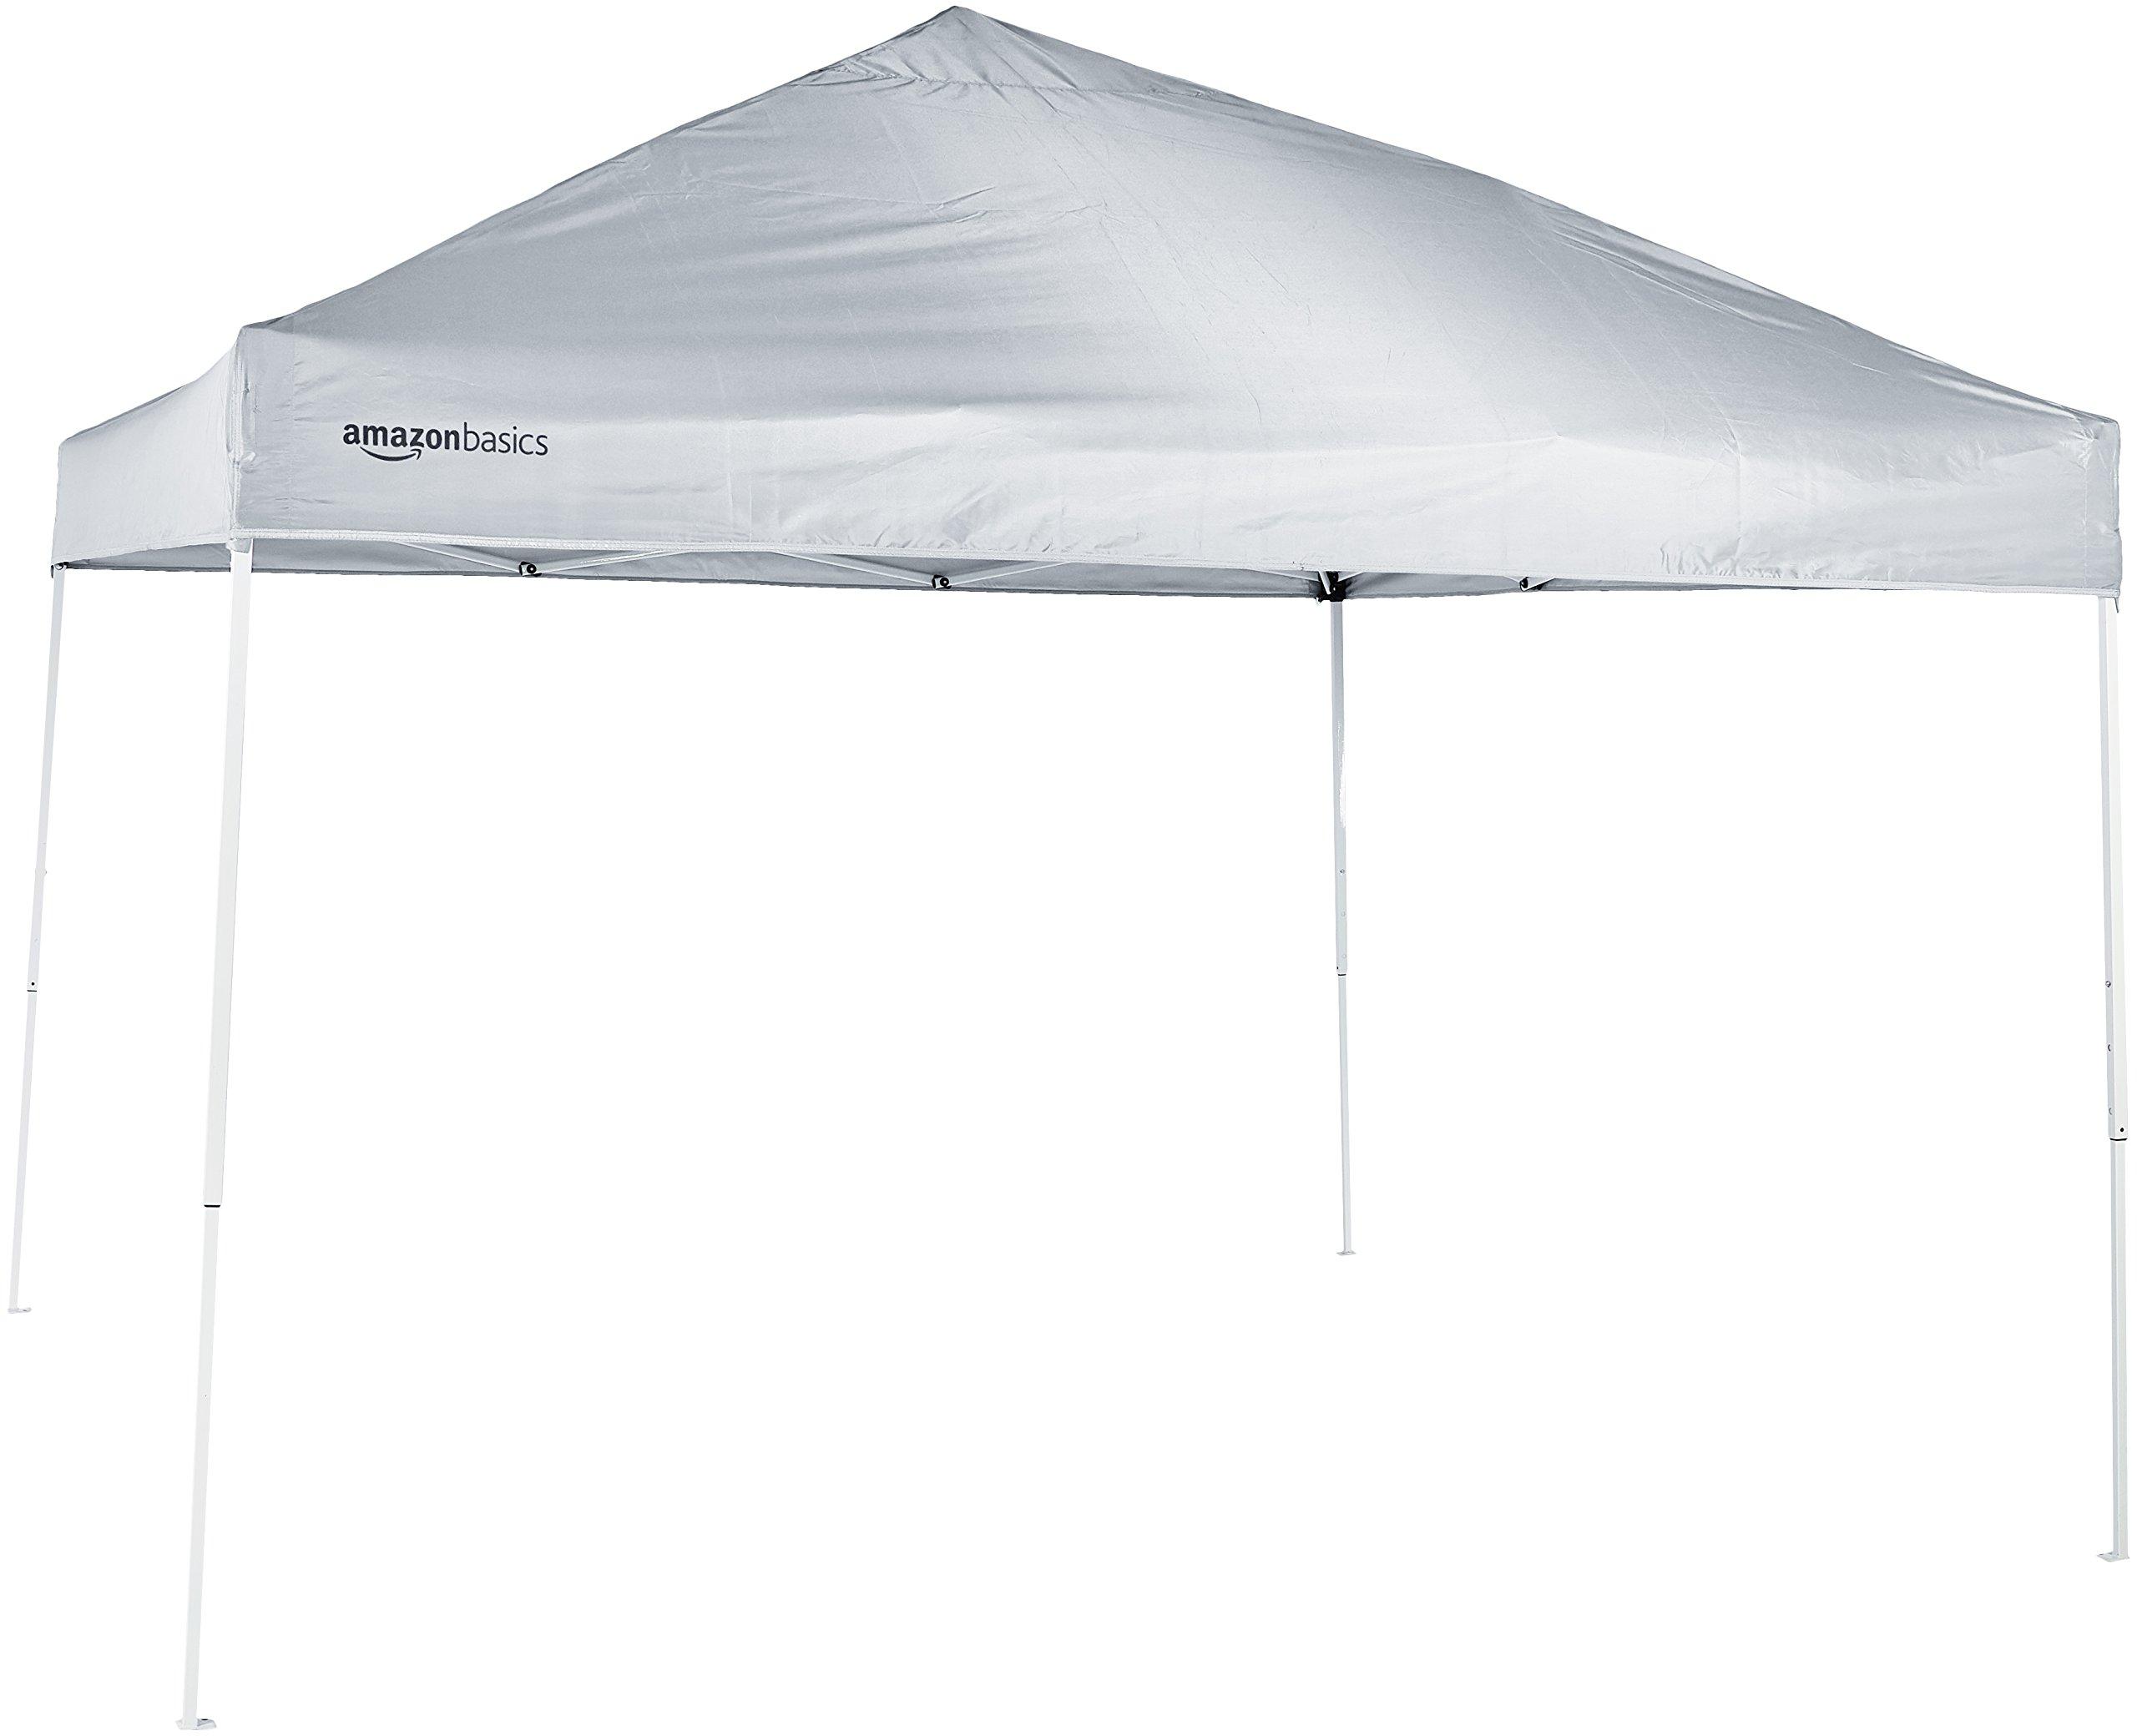 AmazonBasics Pop-Up Canopy Tent - 10' x 10', White